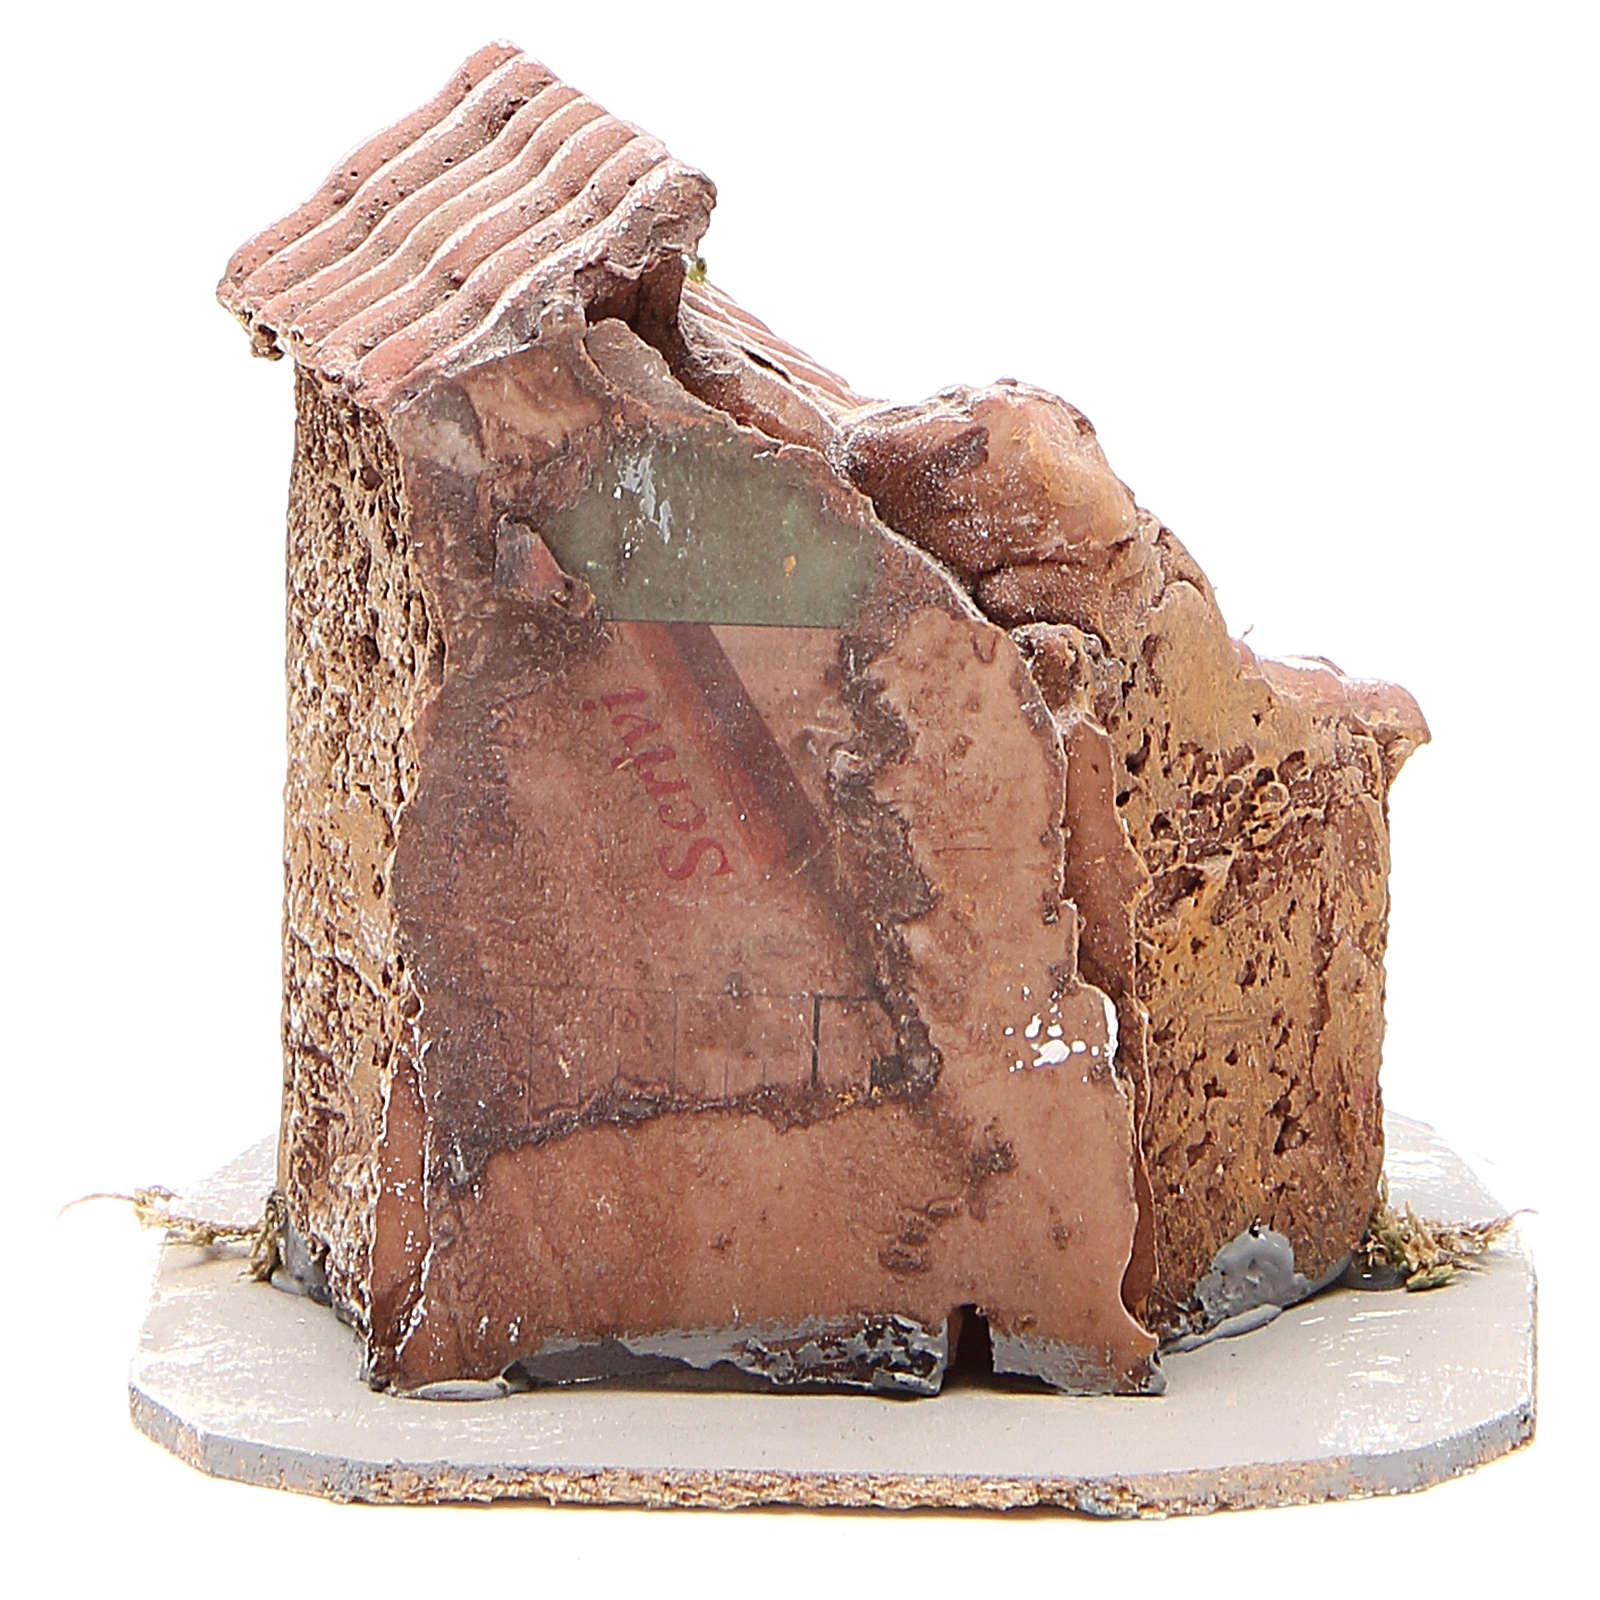 casa belén napolitano resina y madera 14x14x14 cm 4